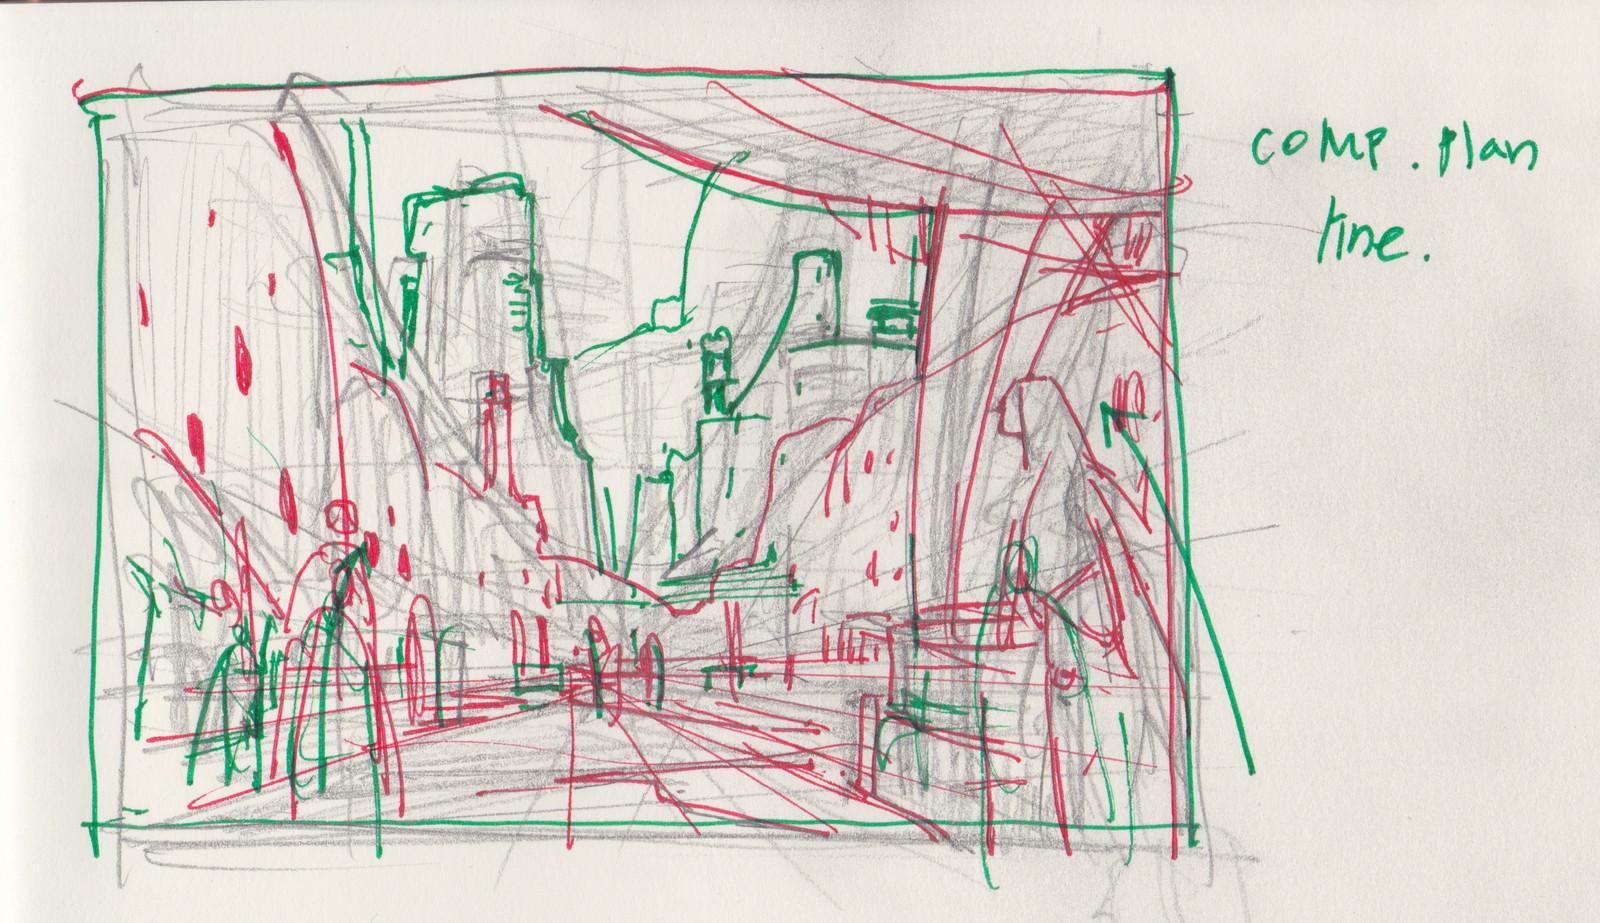 Xerxian Hideout / Insurgent sketch plan